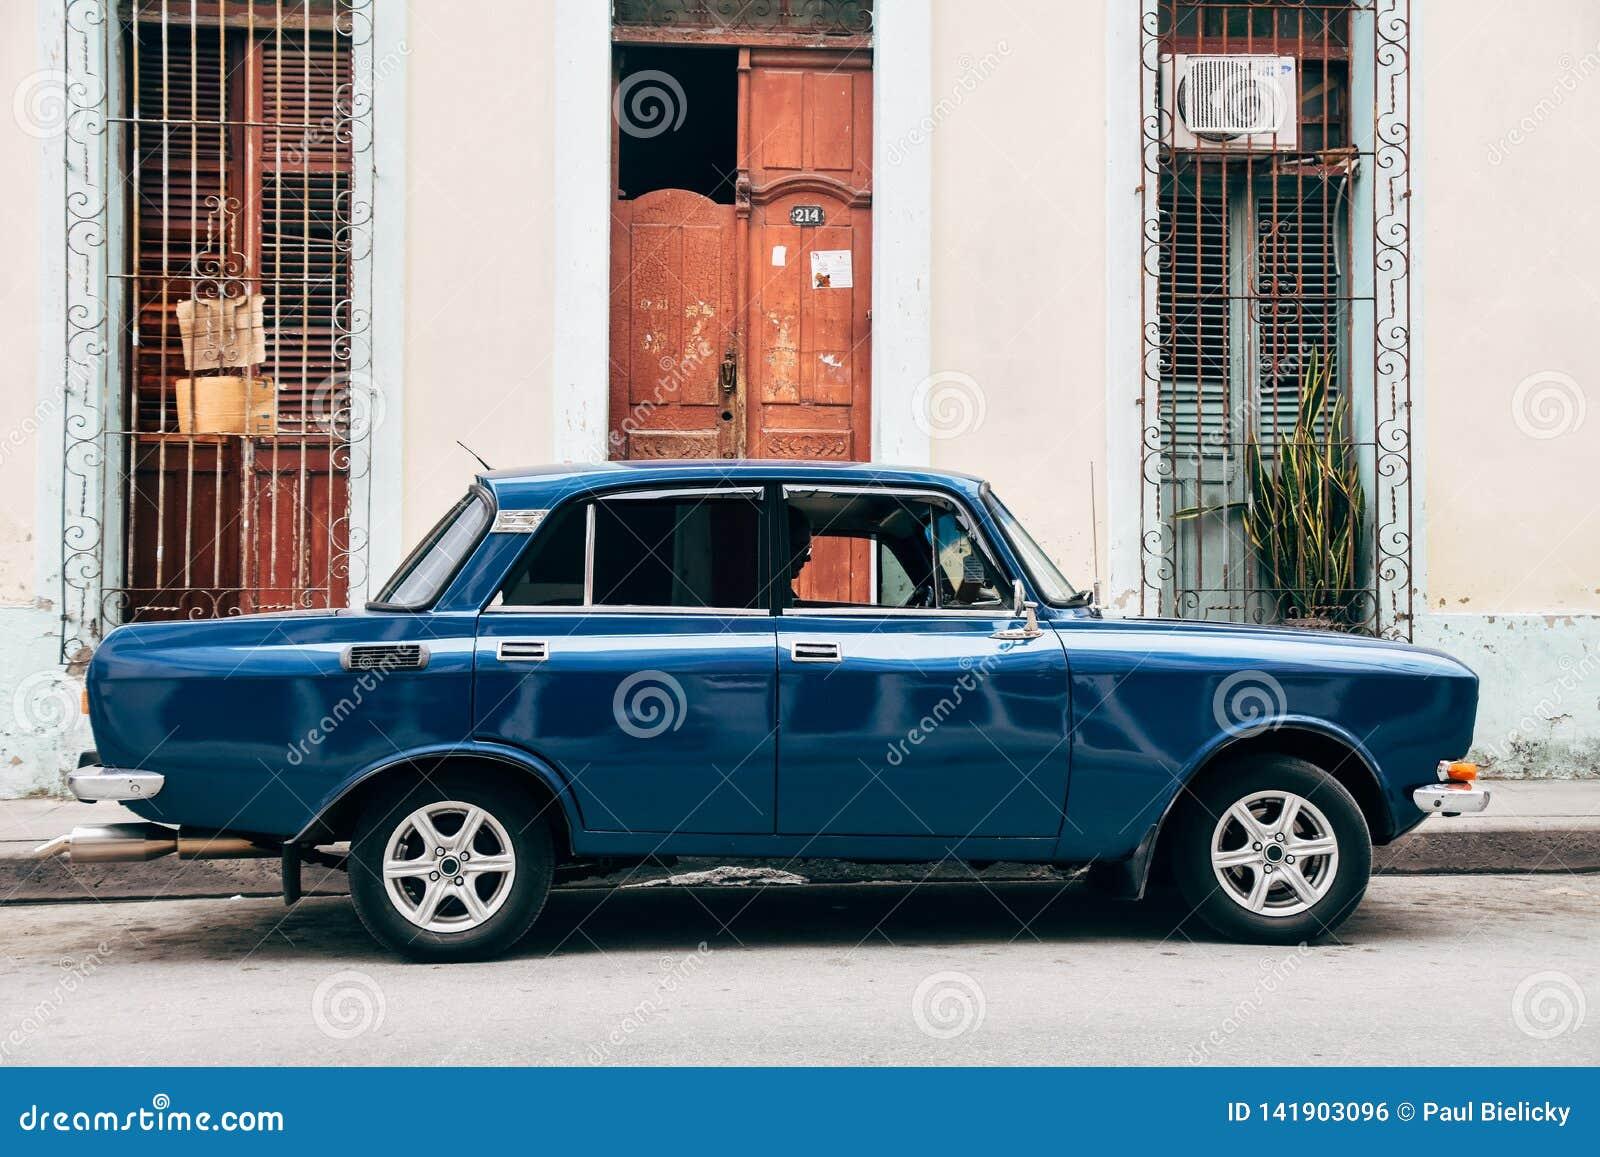 A beautiful classic Lada in Trinidad, Cuba.